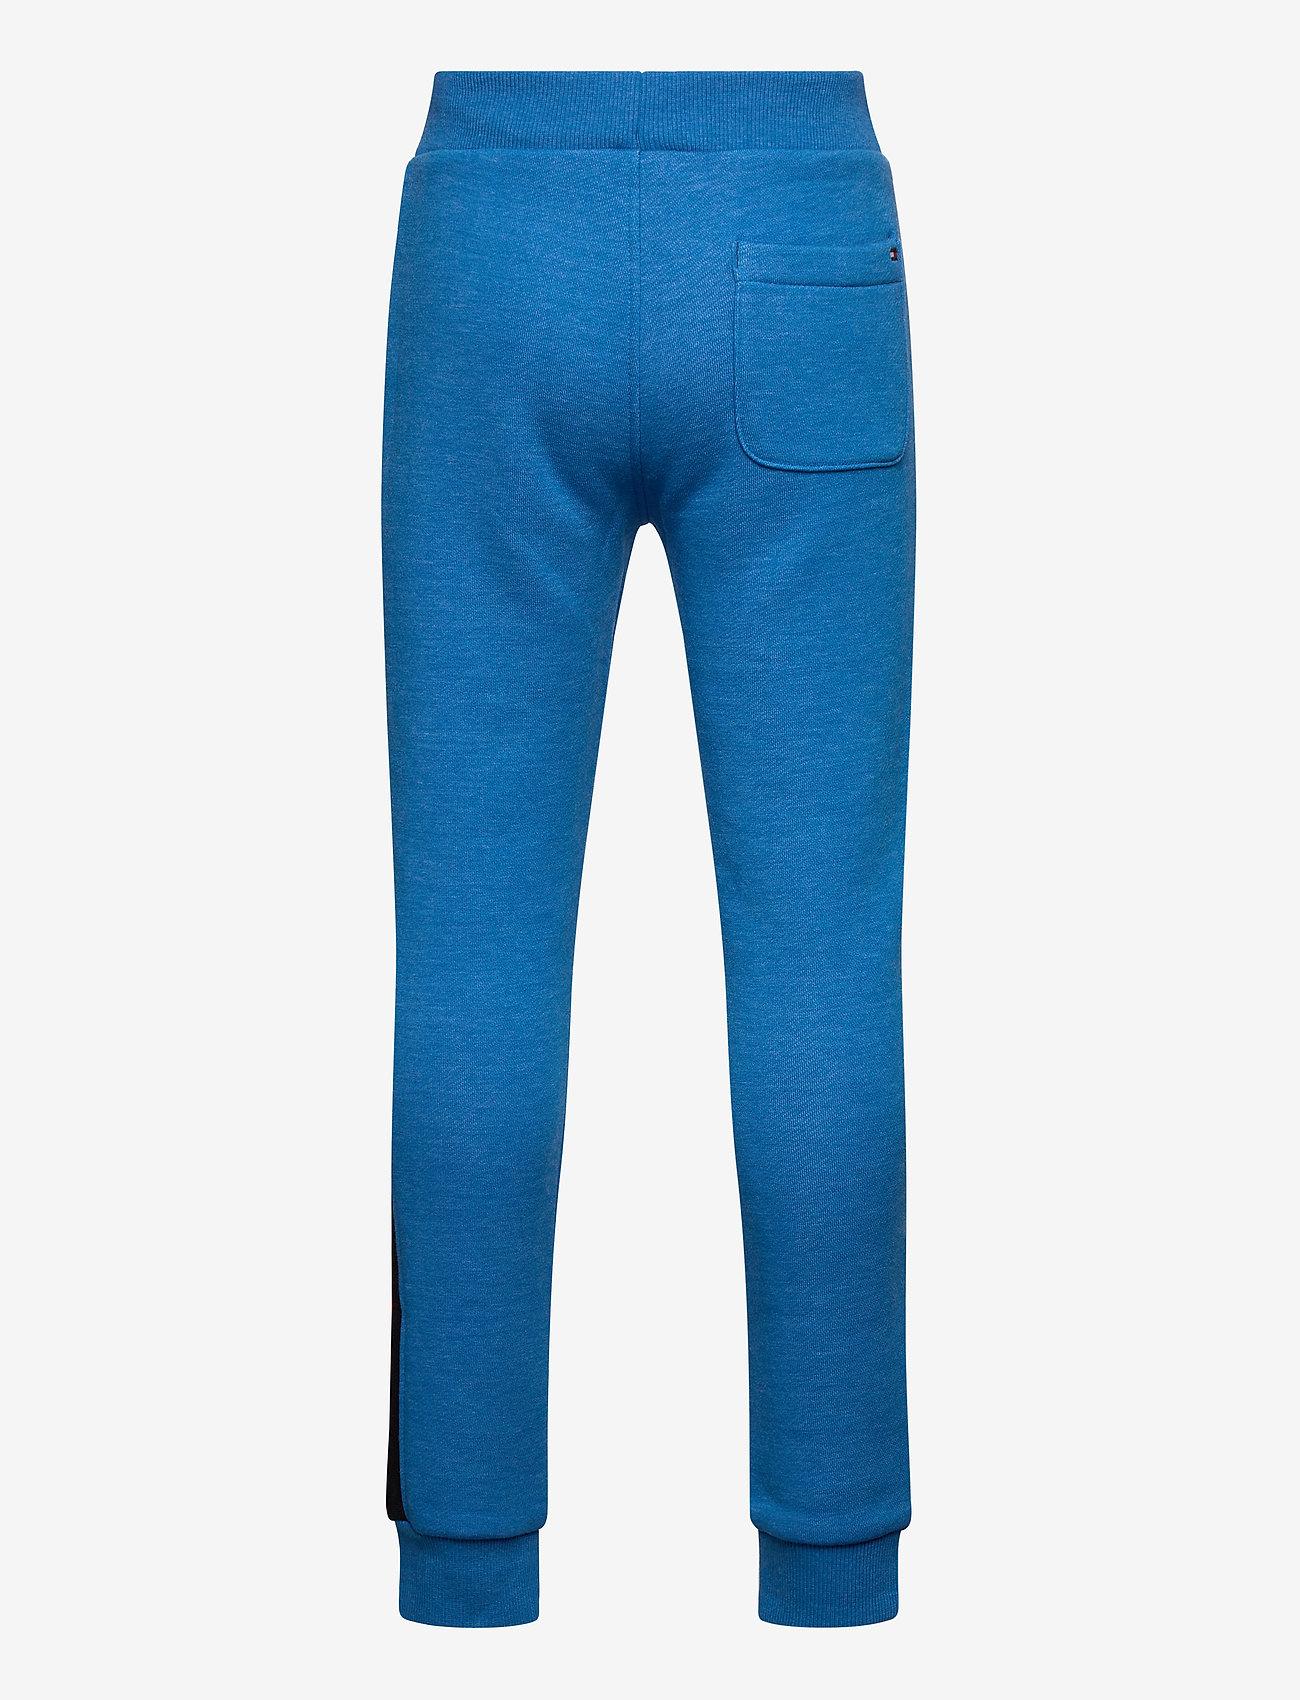 Tommy Hilfiger - INSERT SWEATPANTS - sweatpants - dynamic blue - 1